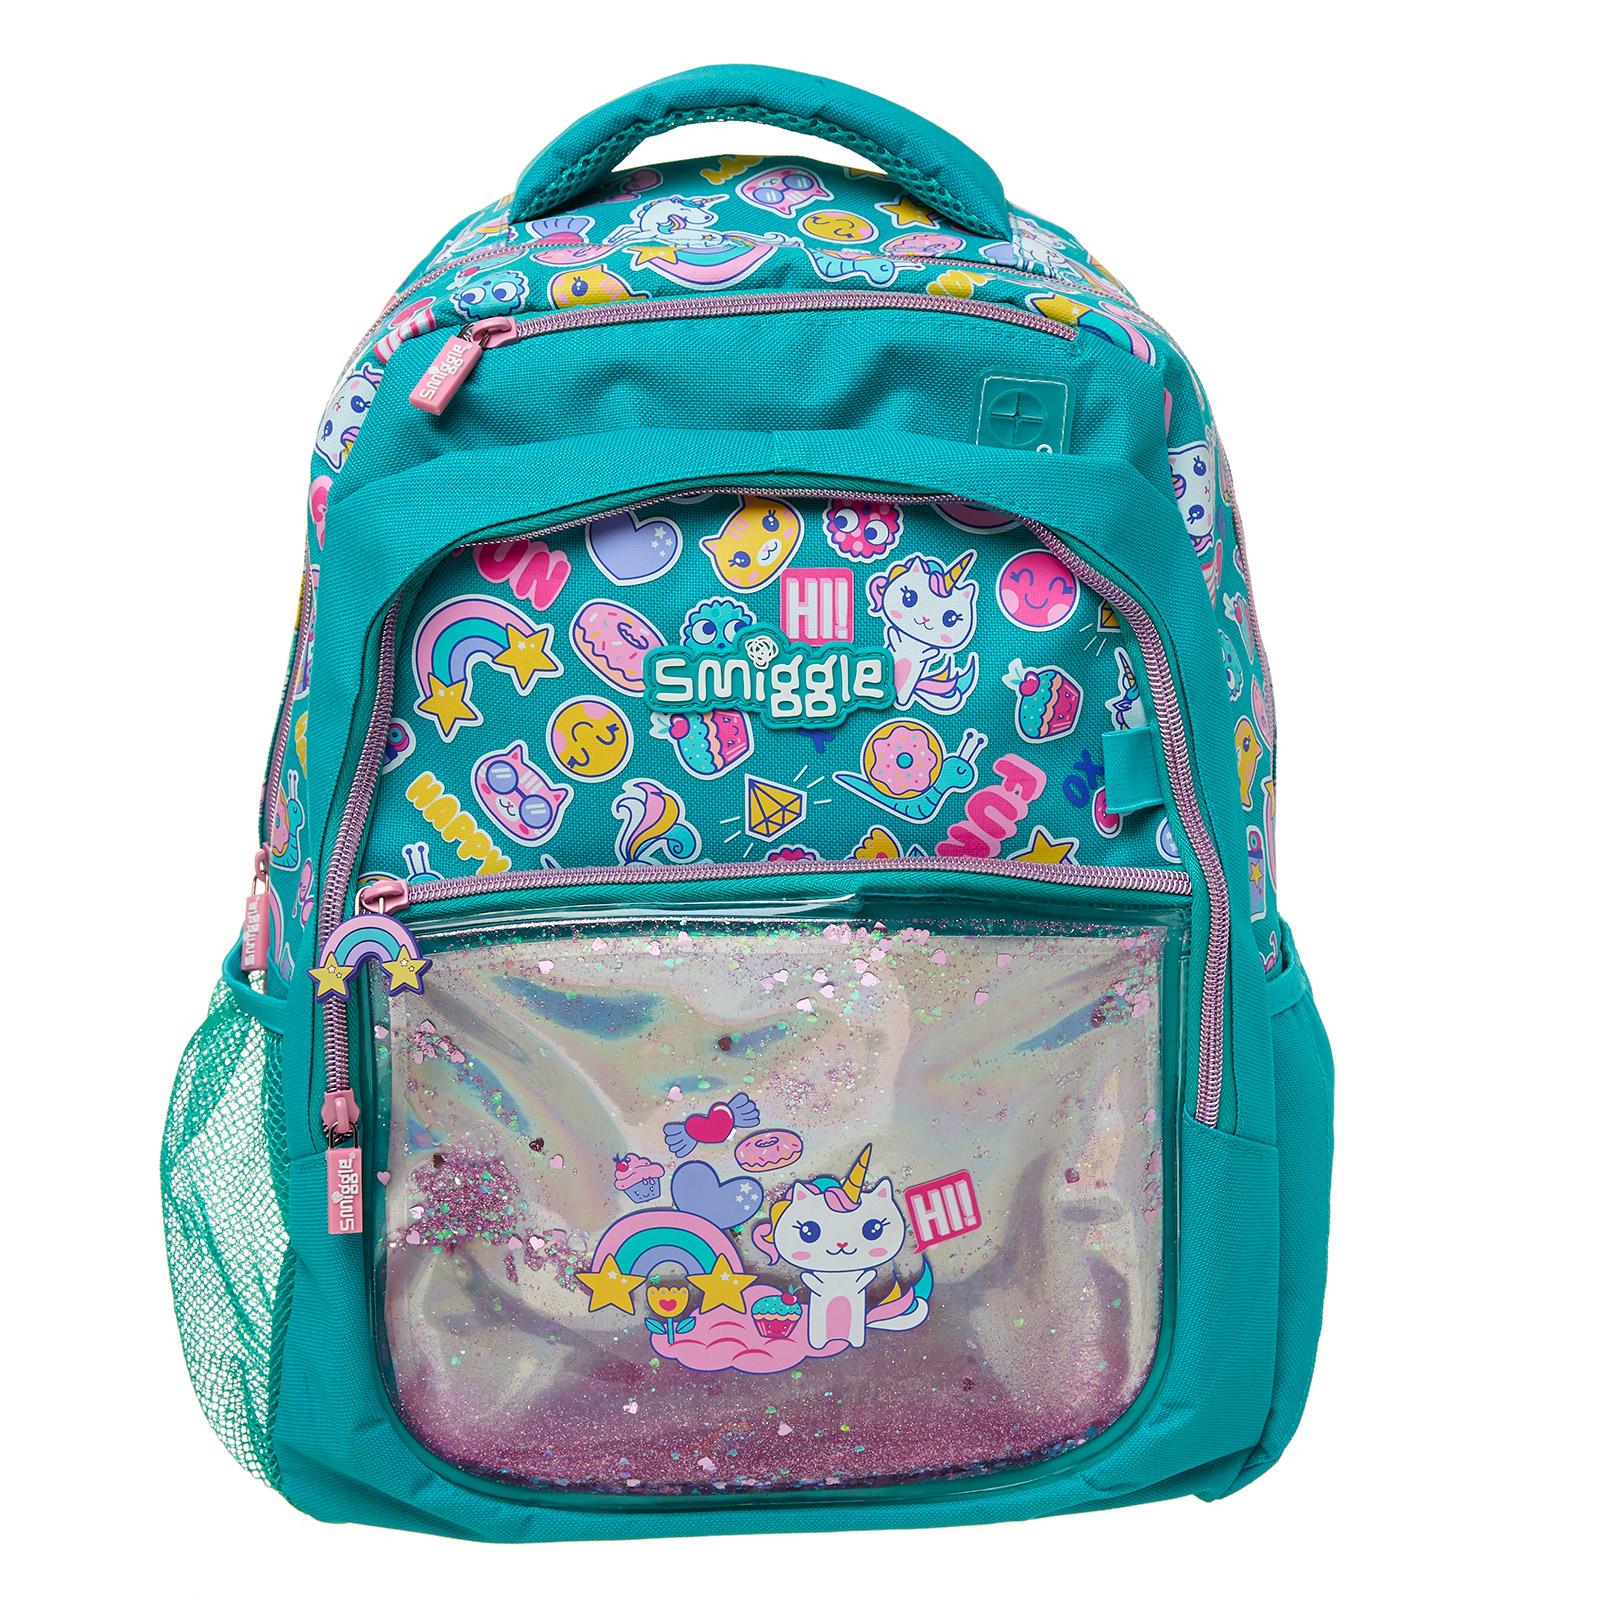 1600x1600 Kids Backpacks, Kids Bags Online Backpacks Smiggle